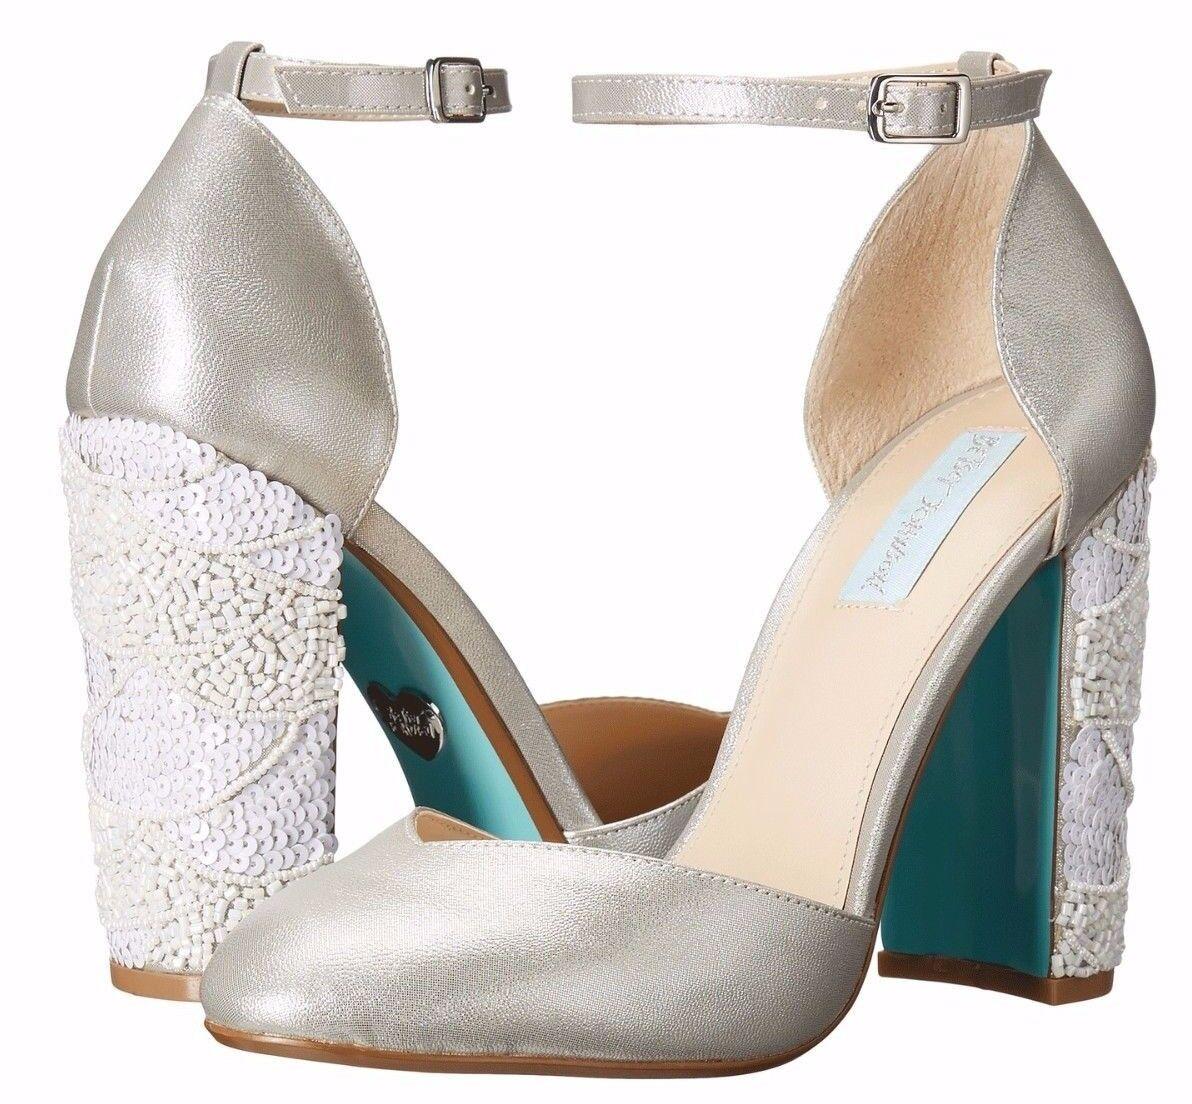 bellissima NUOVO blu by Betsey Johnson Sz7US Sybil Con Perline Perline Perline Tacco Sandalo argentoo Shimmer  grande sconto